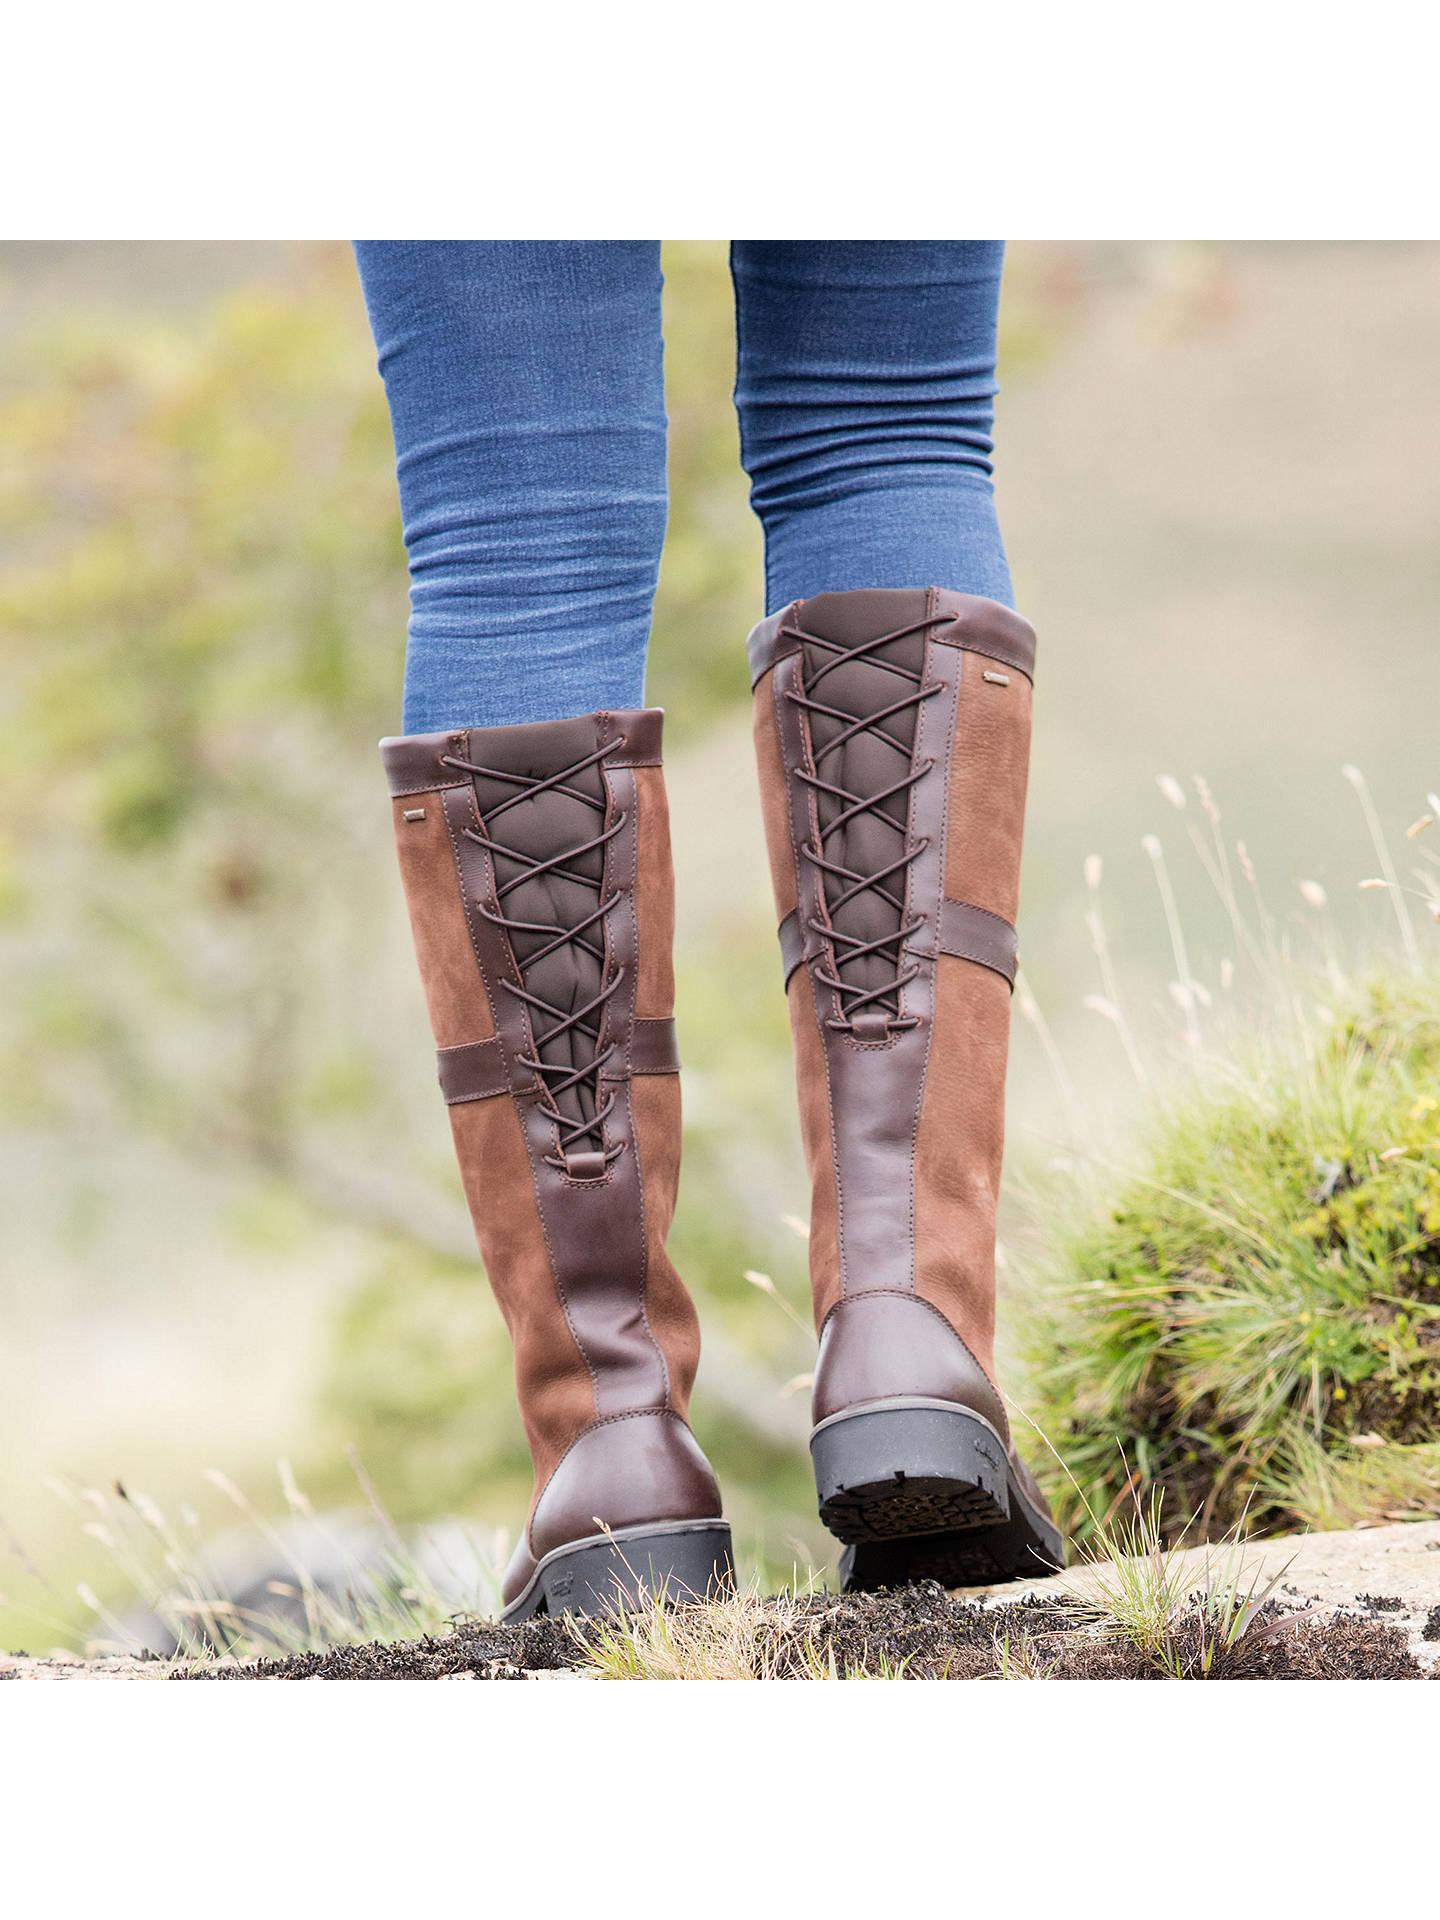 90e1f378e92 Dubarry Glanmire Knee High Boots, Walnut at John Lewis & Partners